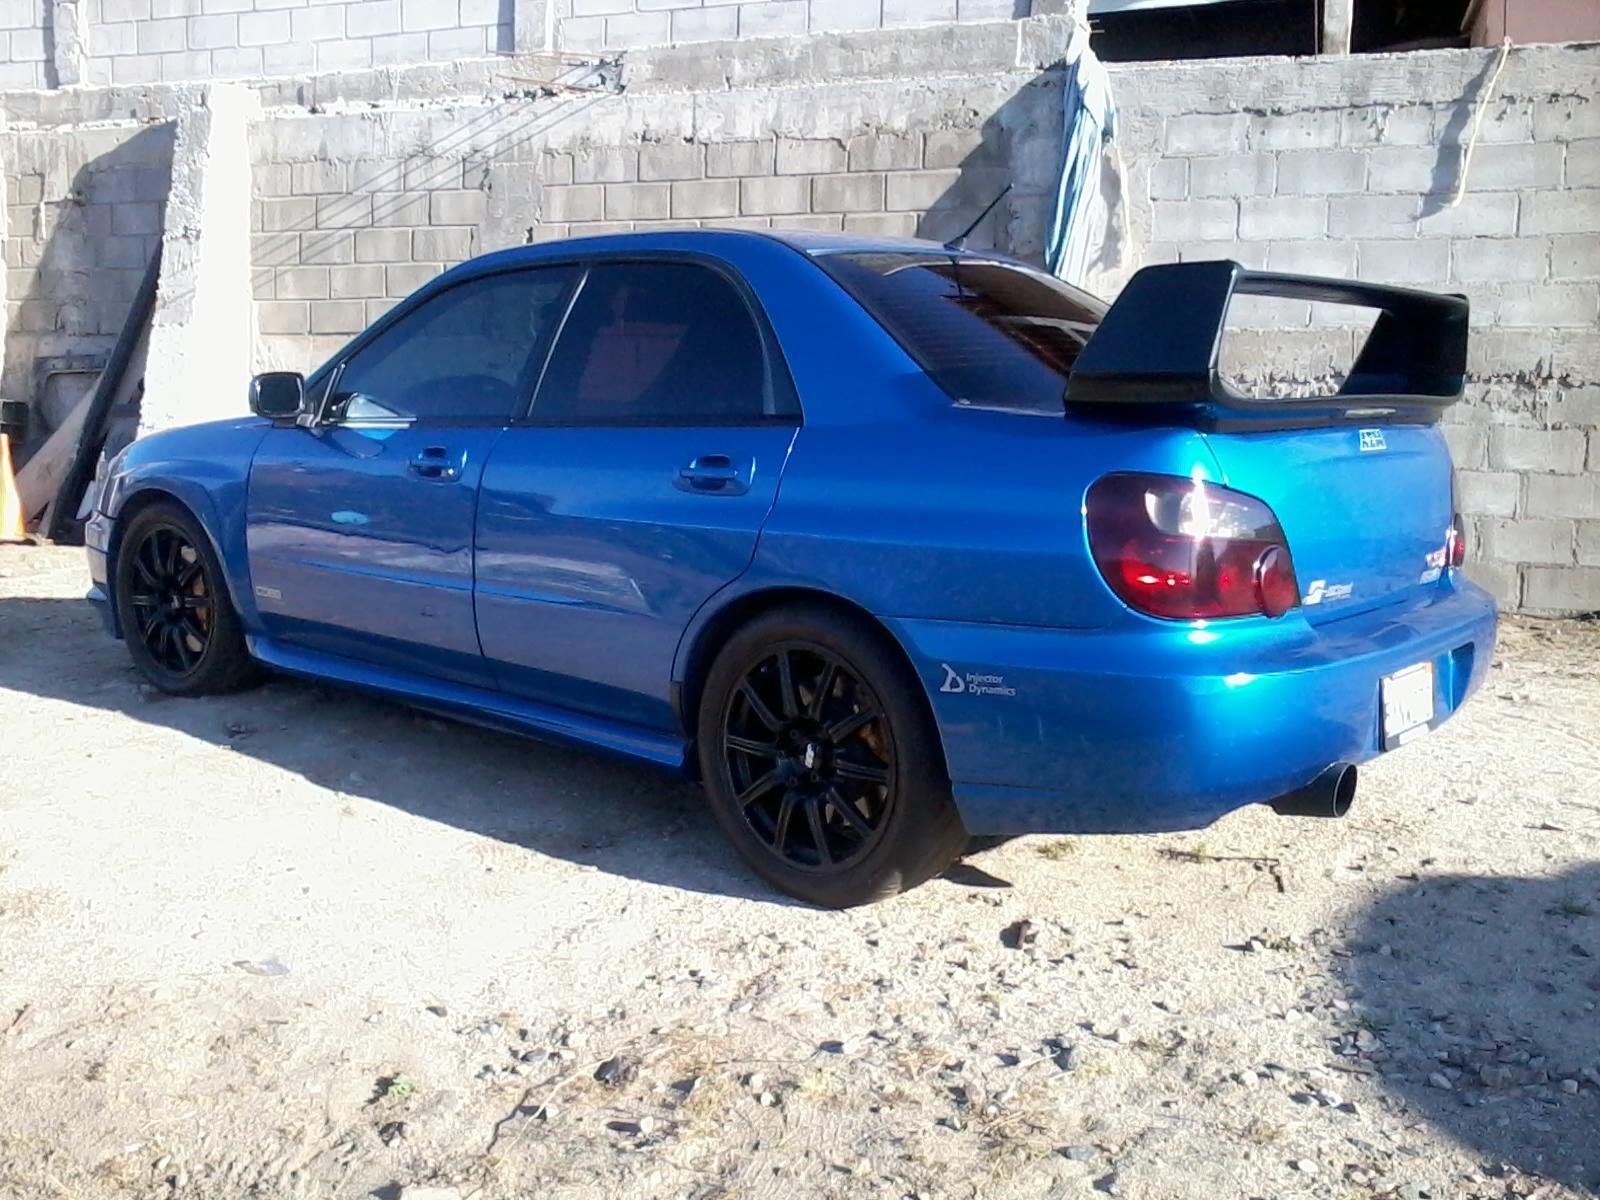 2004 Blue Subaru Impreza Sti Pictures Mods Upgrades